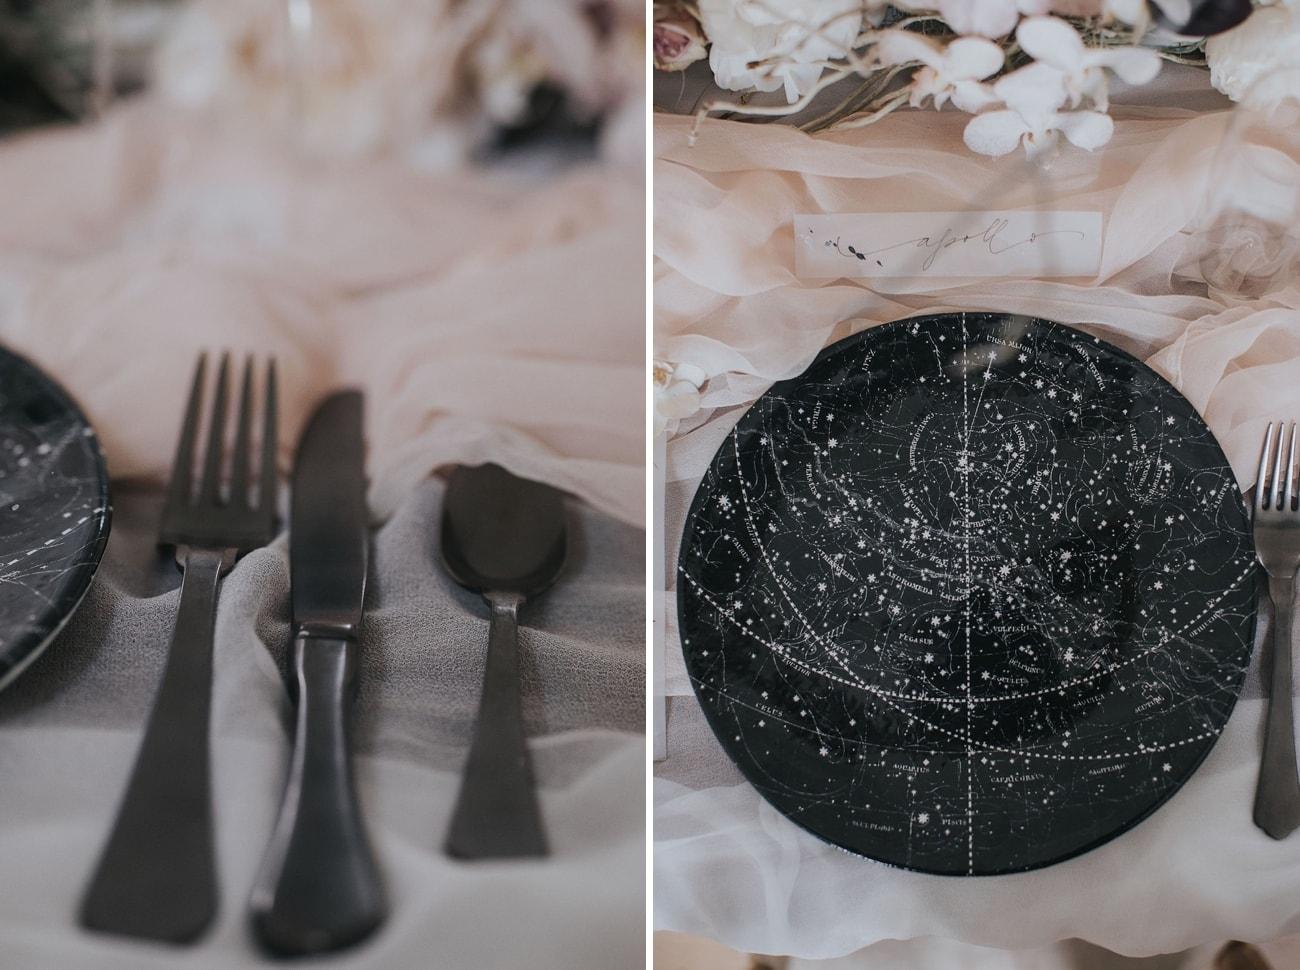 Celestial Wedding Place Setting | Credit: Cornelia Lietz